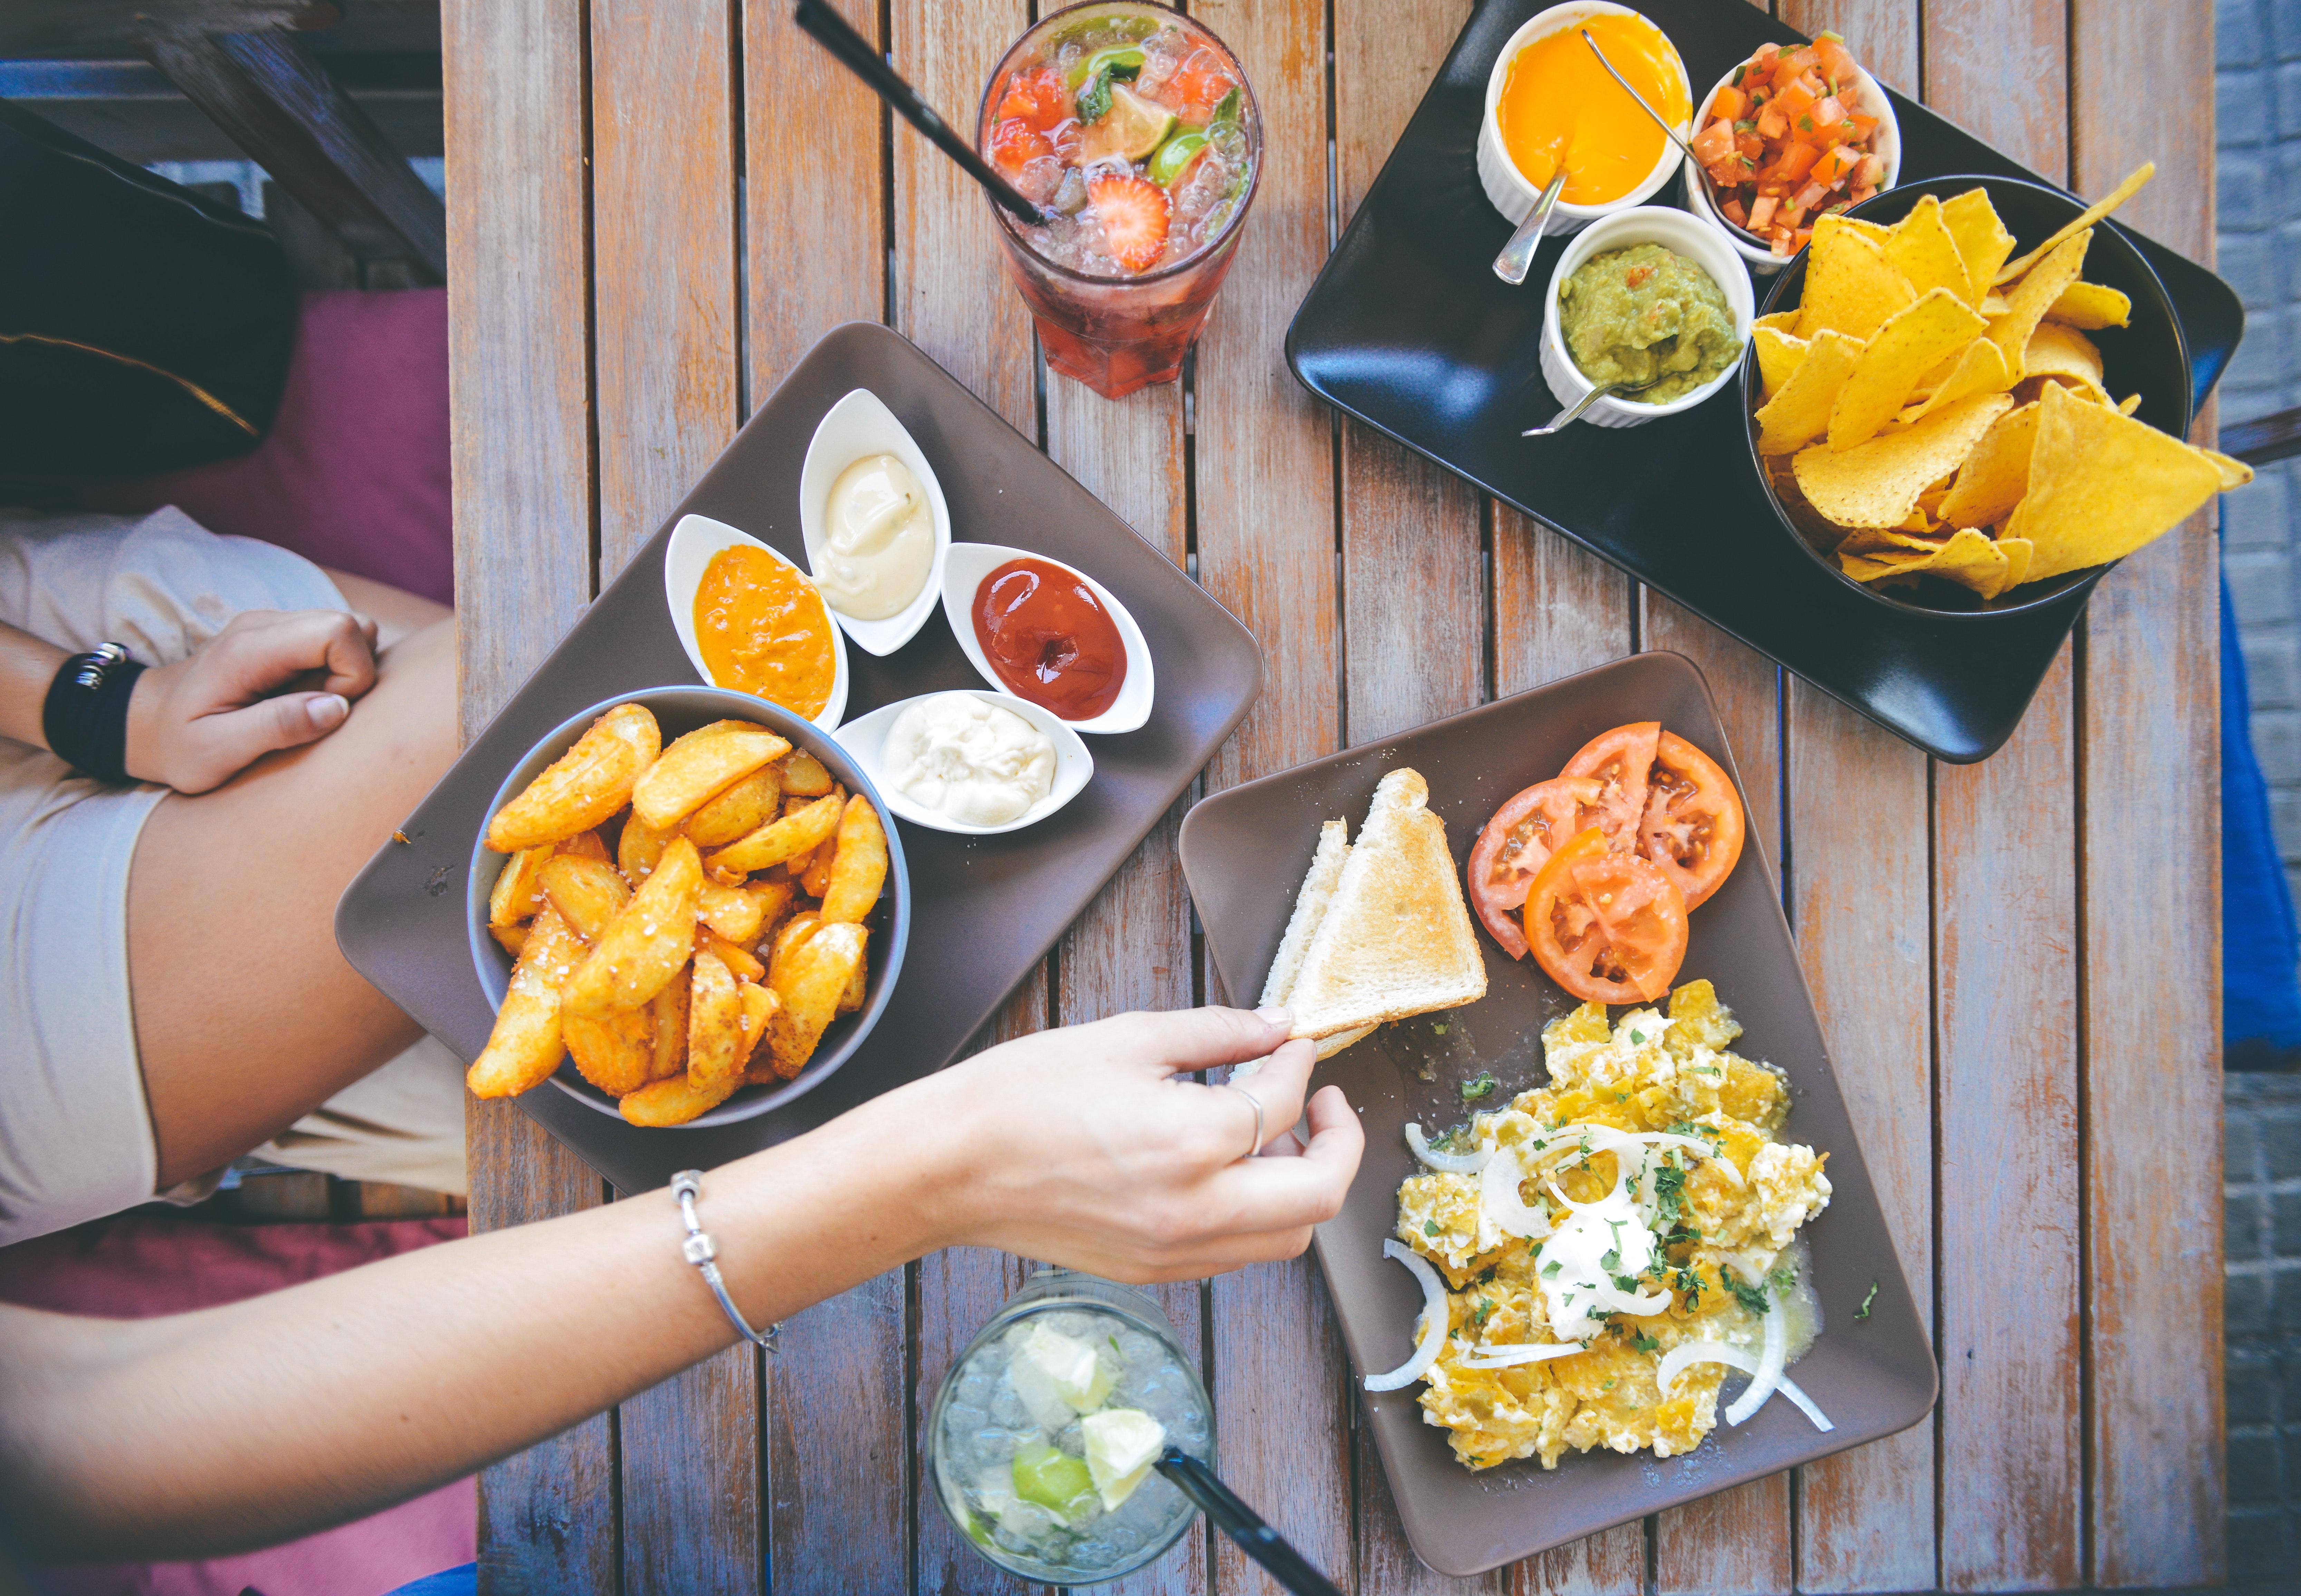 catering; under-declarations of sales; restaurant owner; cafe owner; take-away owner; hmrc; cash businesses; vat inspection catering business